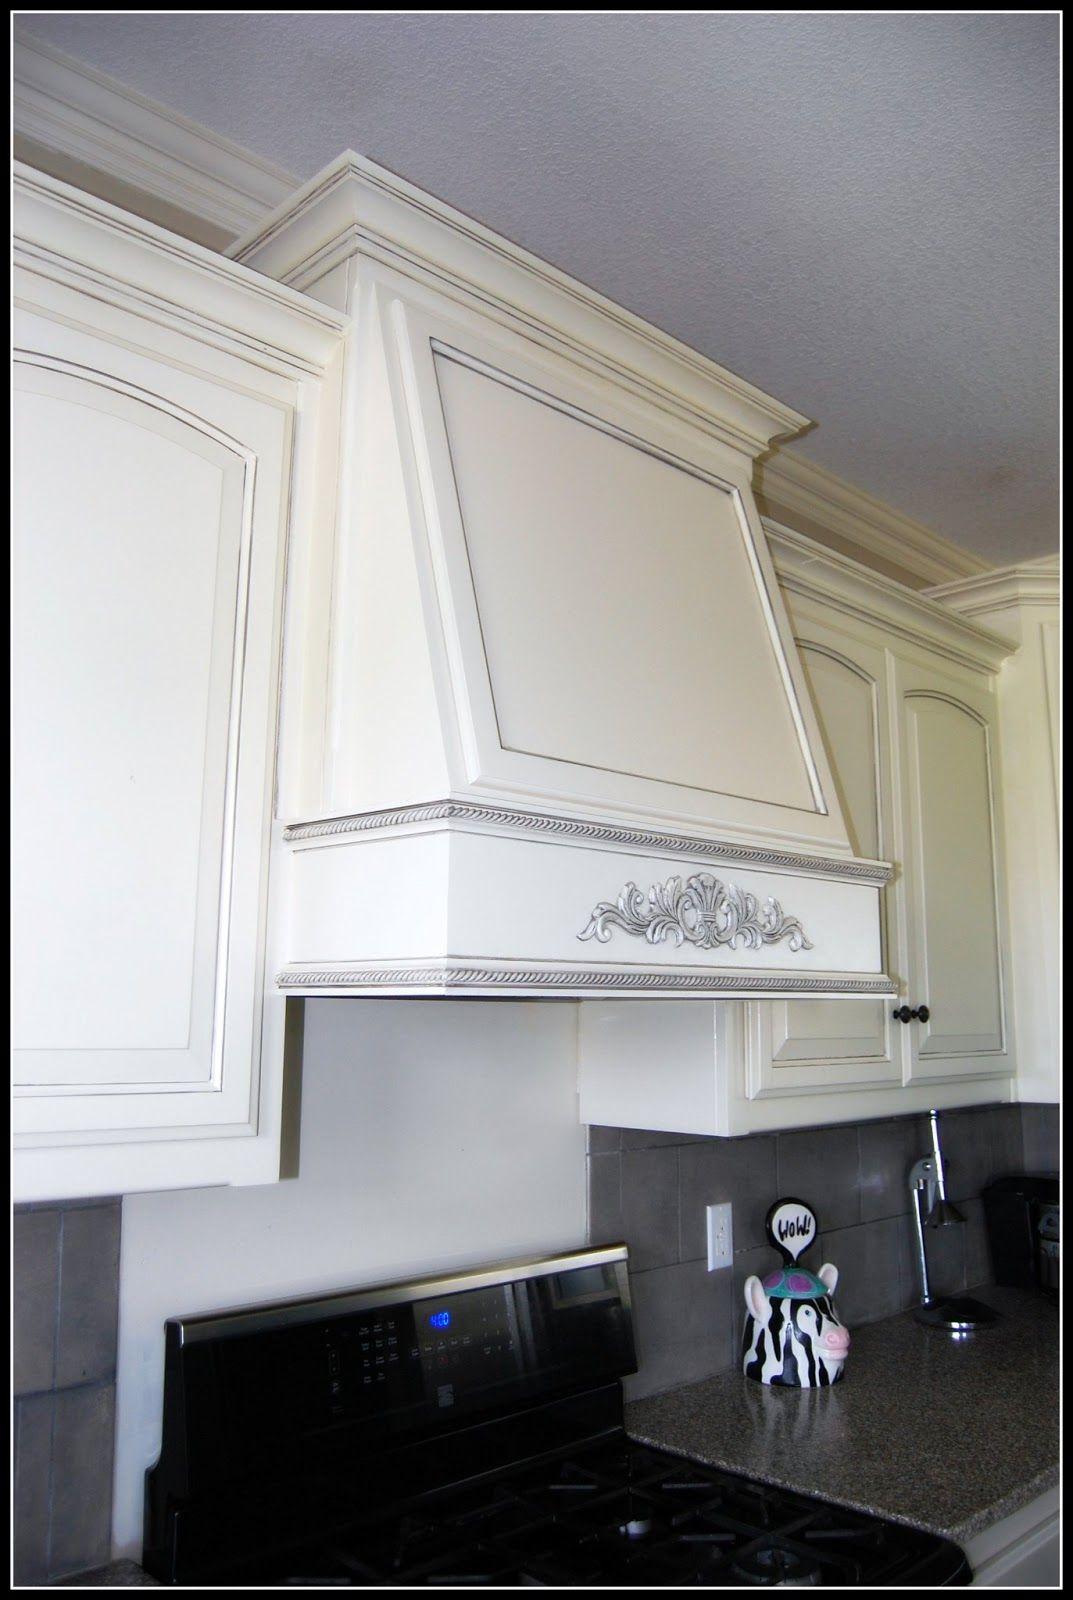 Diy Decorative Hood Range Vent Kitchen Vent Kitchen Range Hood Kitchen Accessories Decor